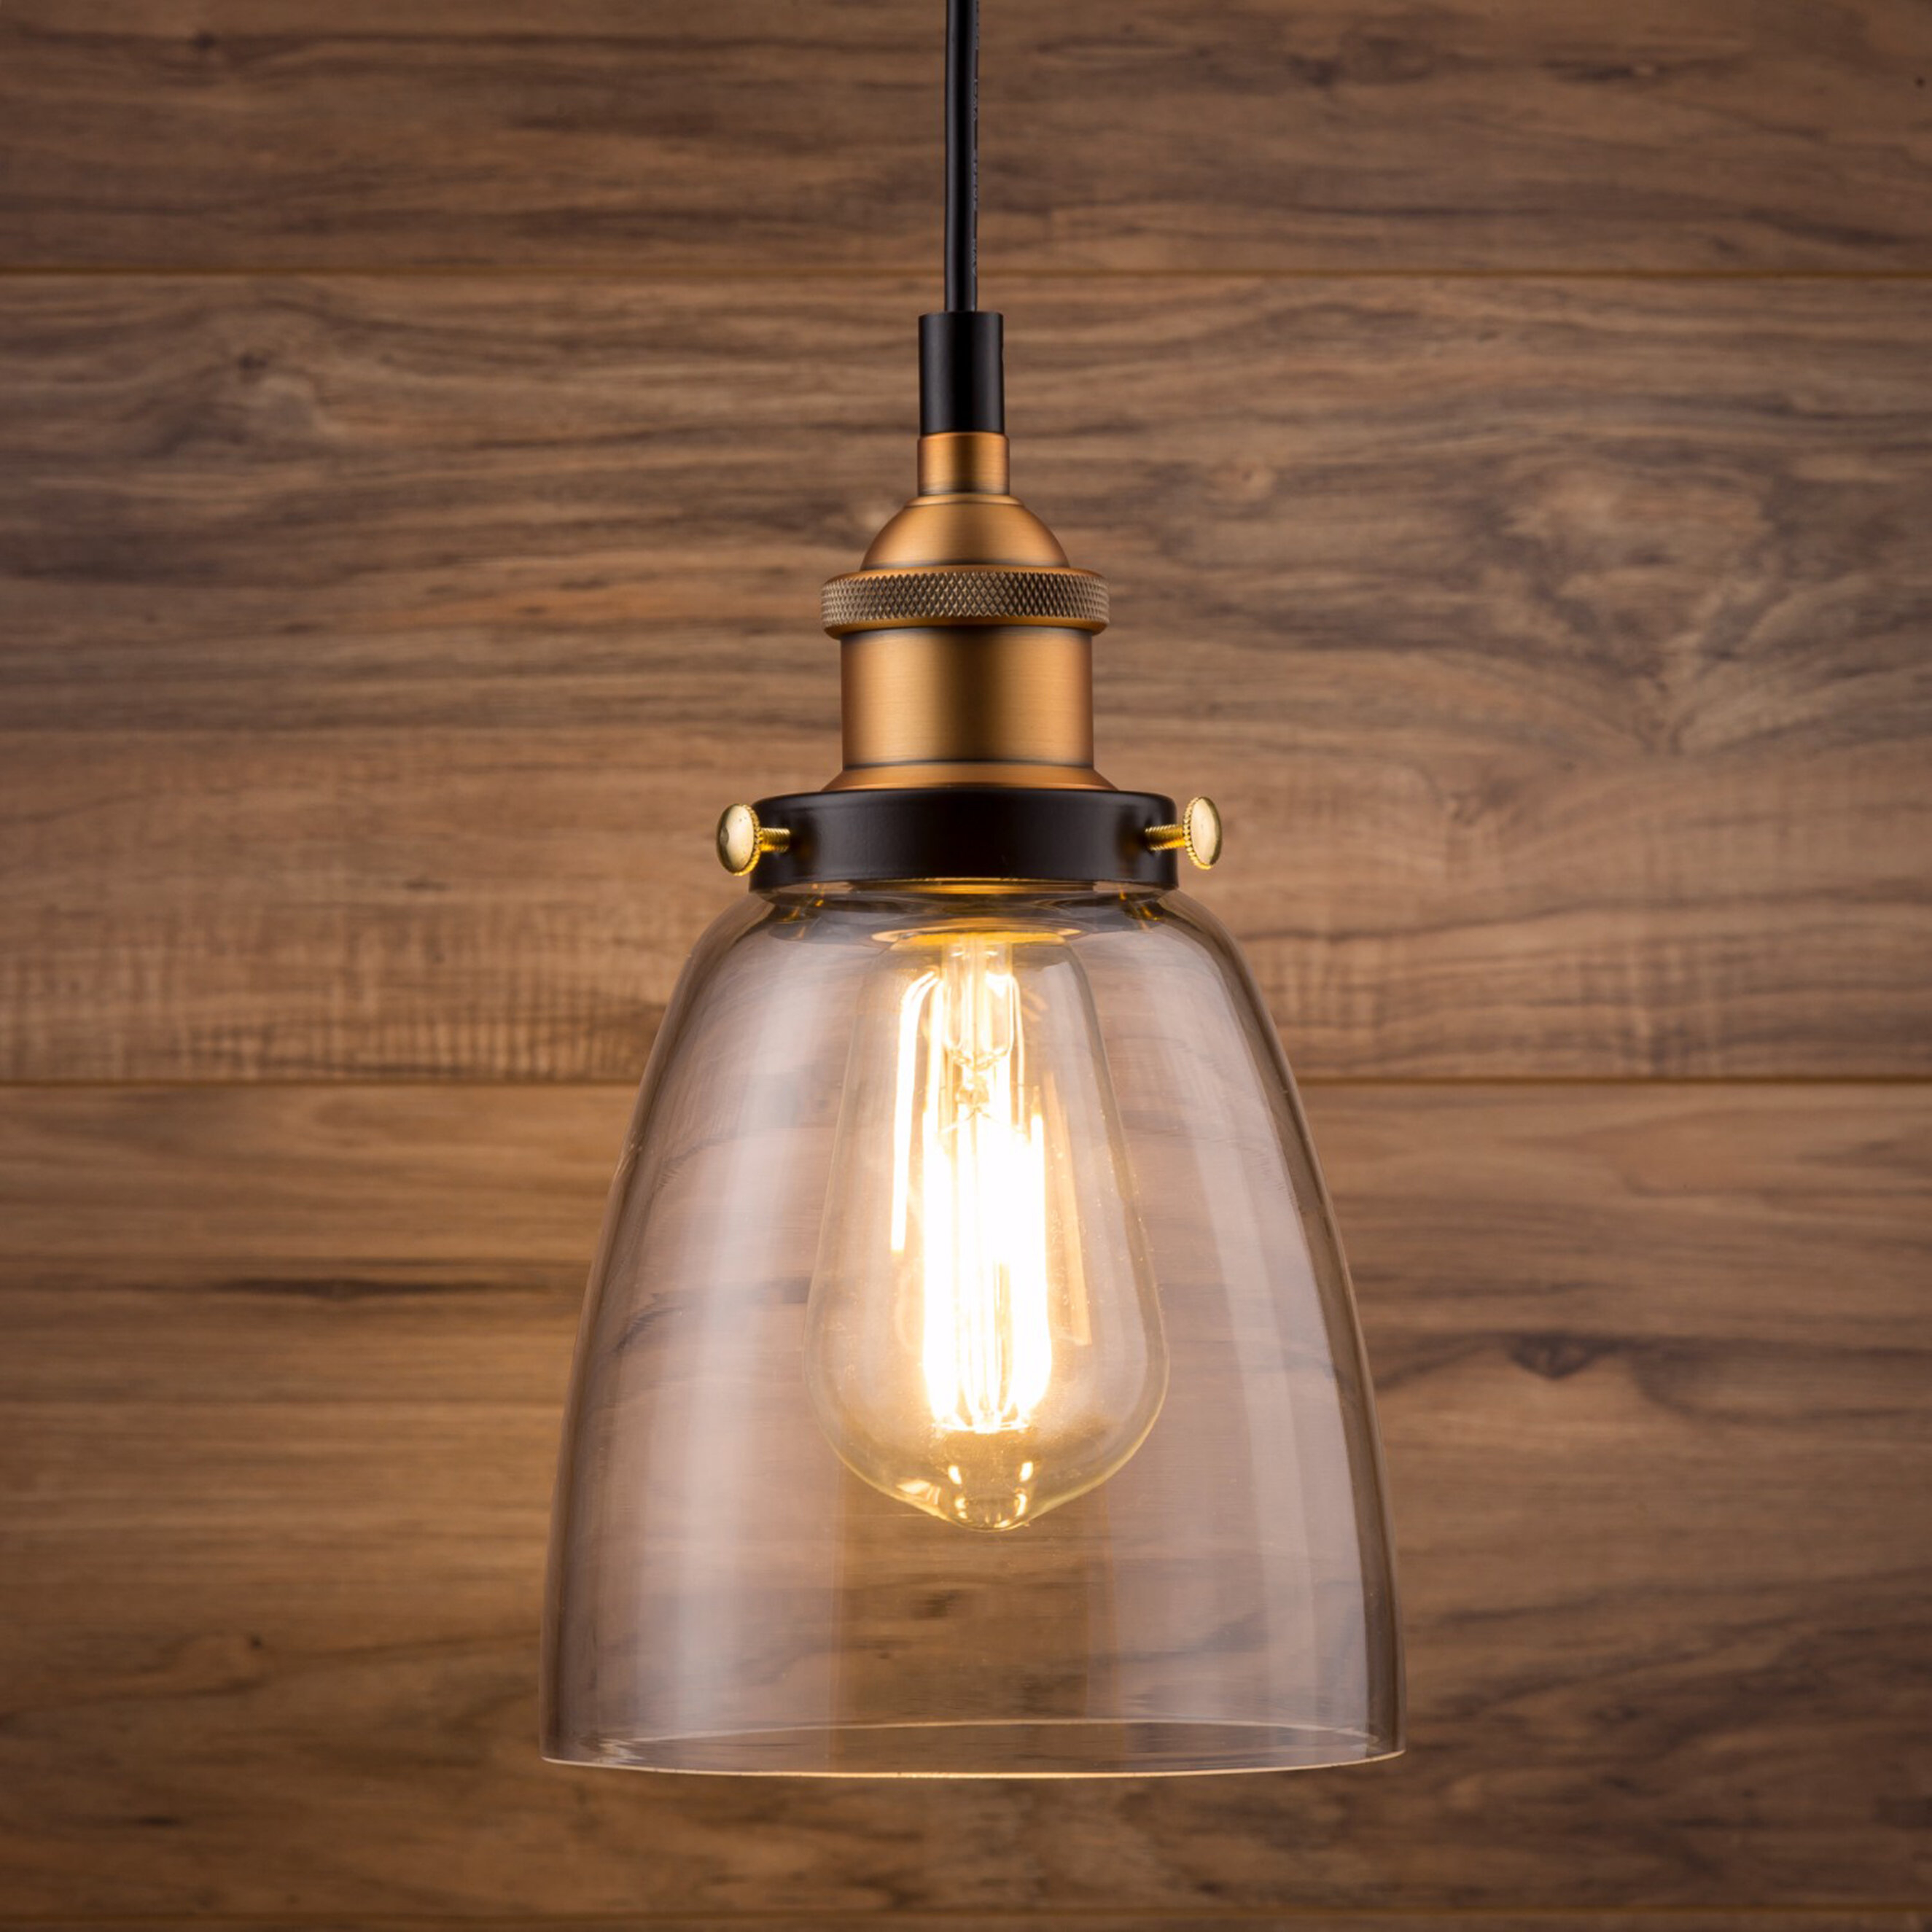 Bundaberg 1 Light Single Bell Pendant Throughout 1 Light Single Bell Pendants (View 6 of 30)